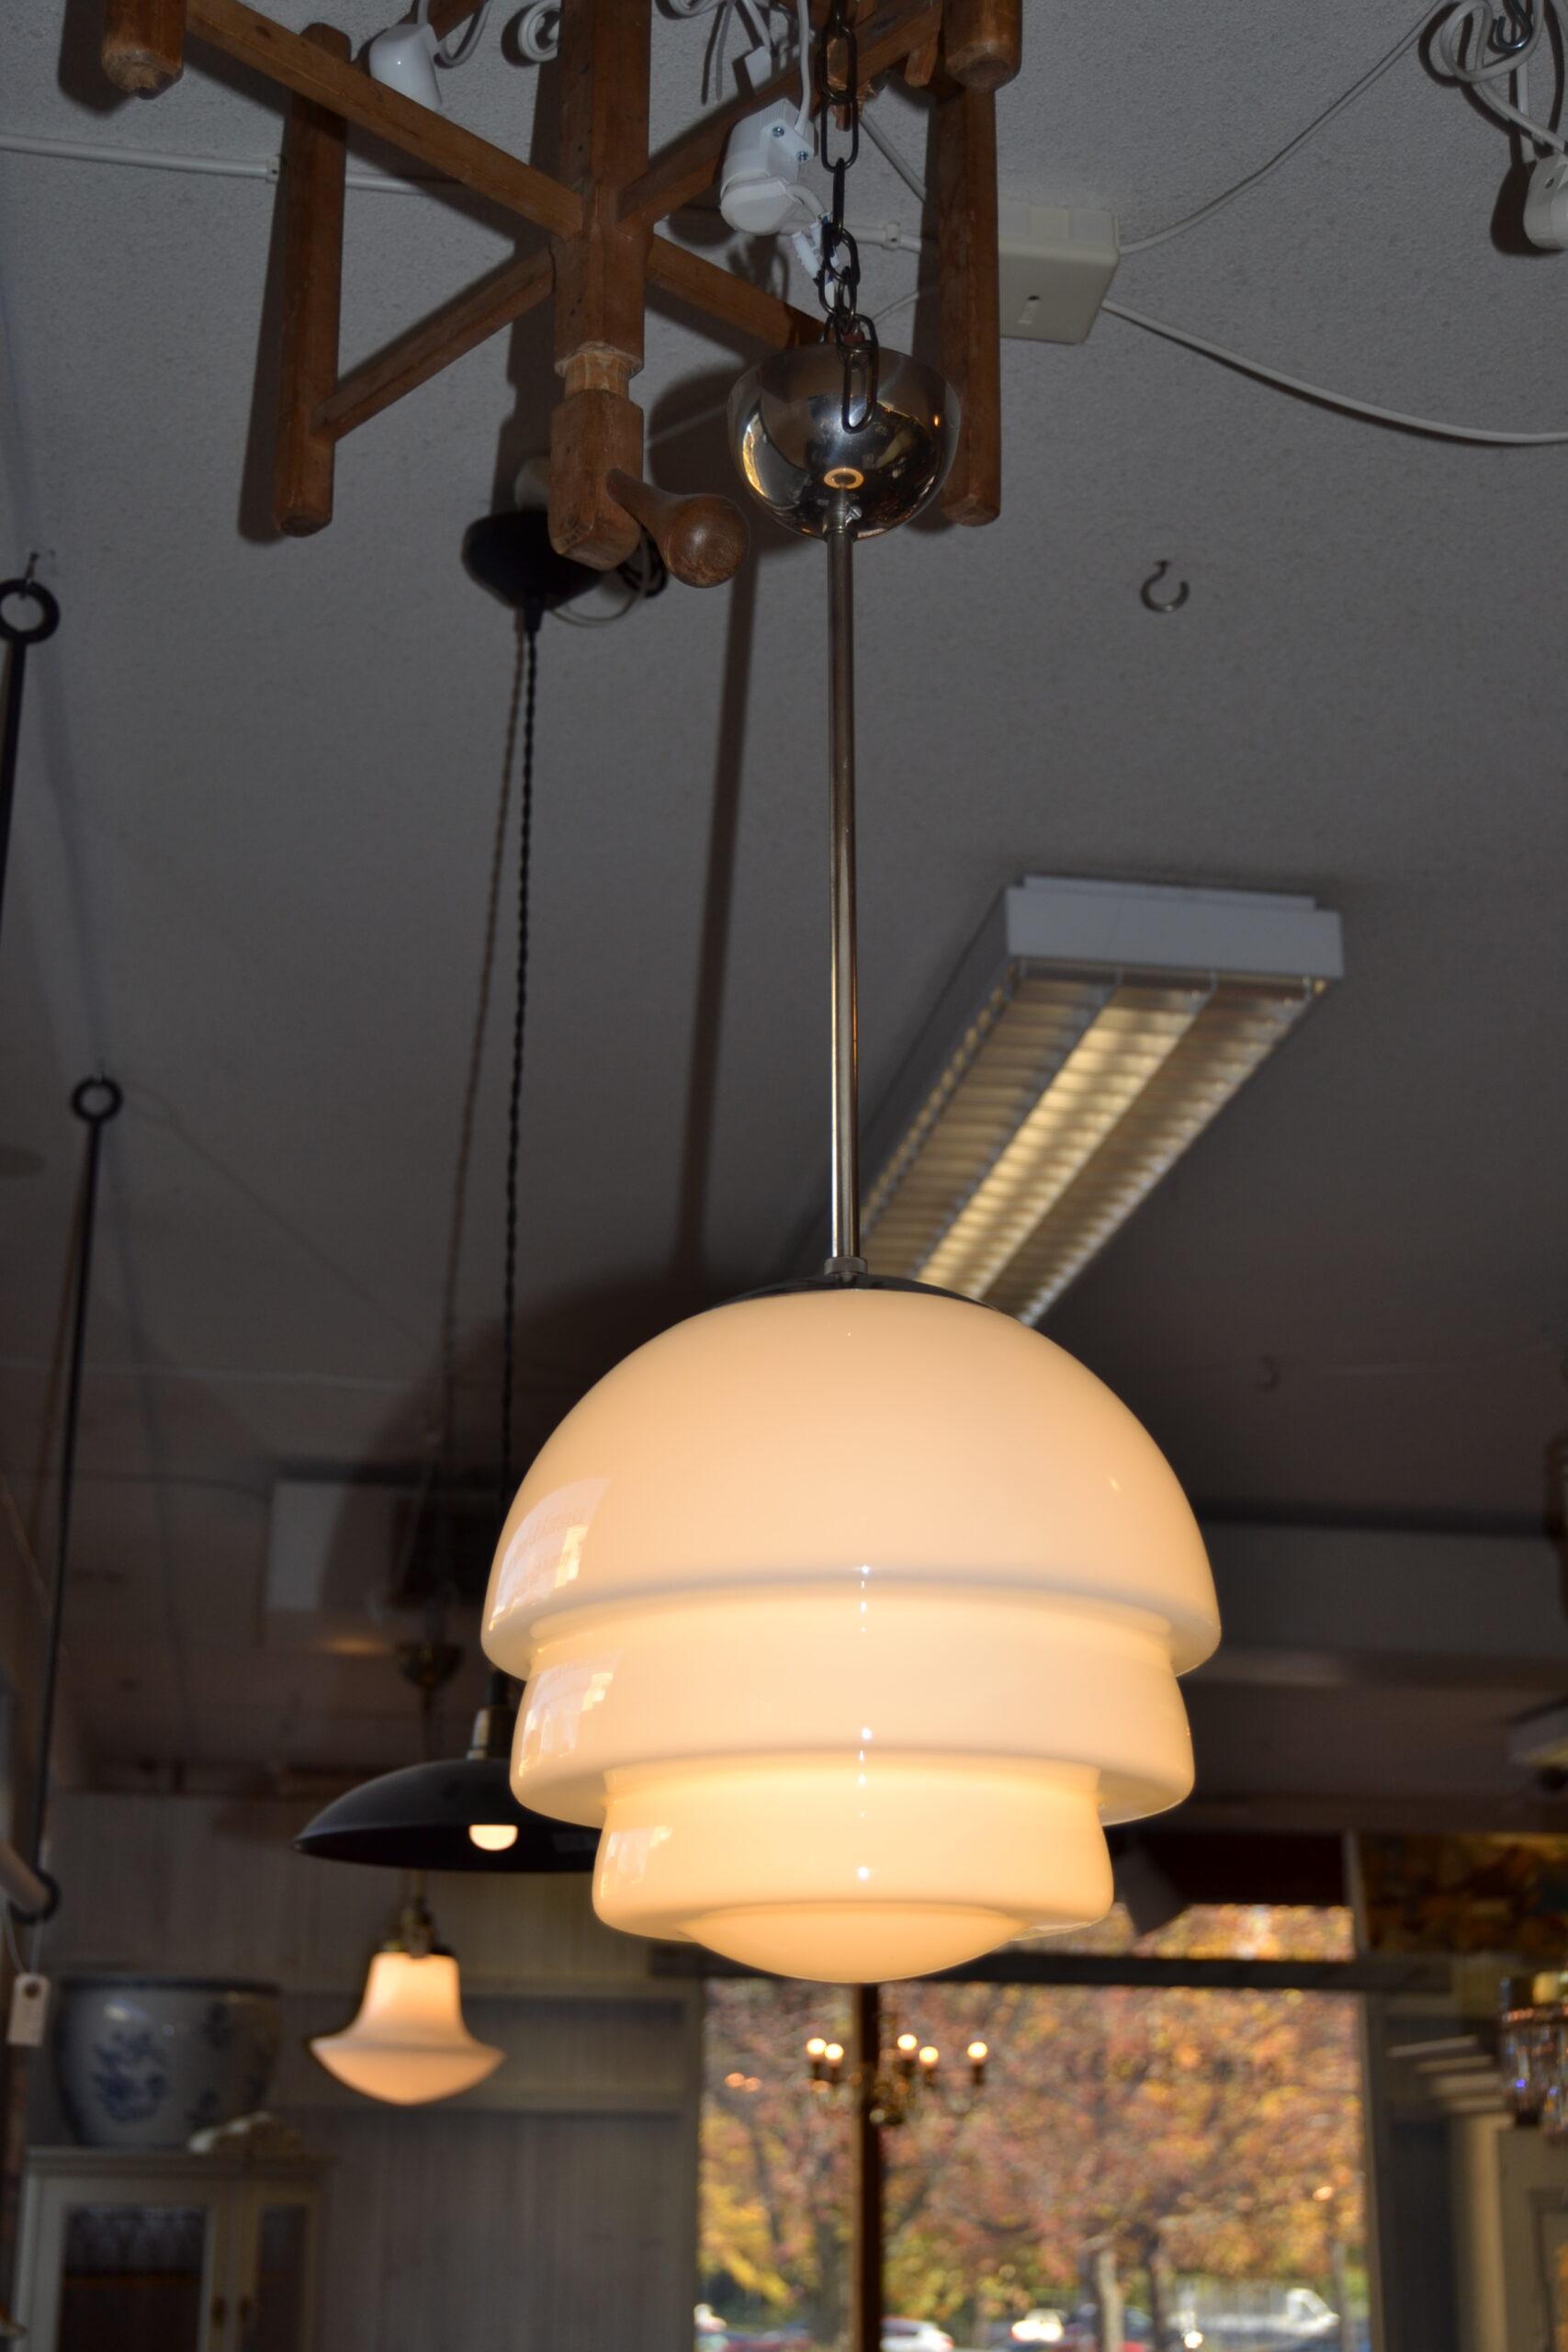 Art deco pendel taklampa glas & metall kromad